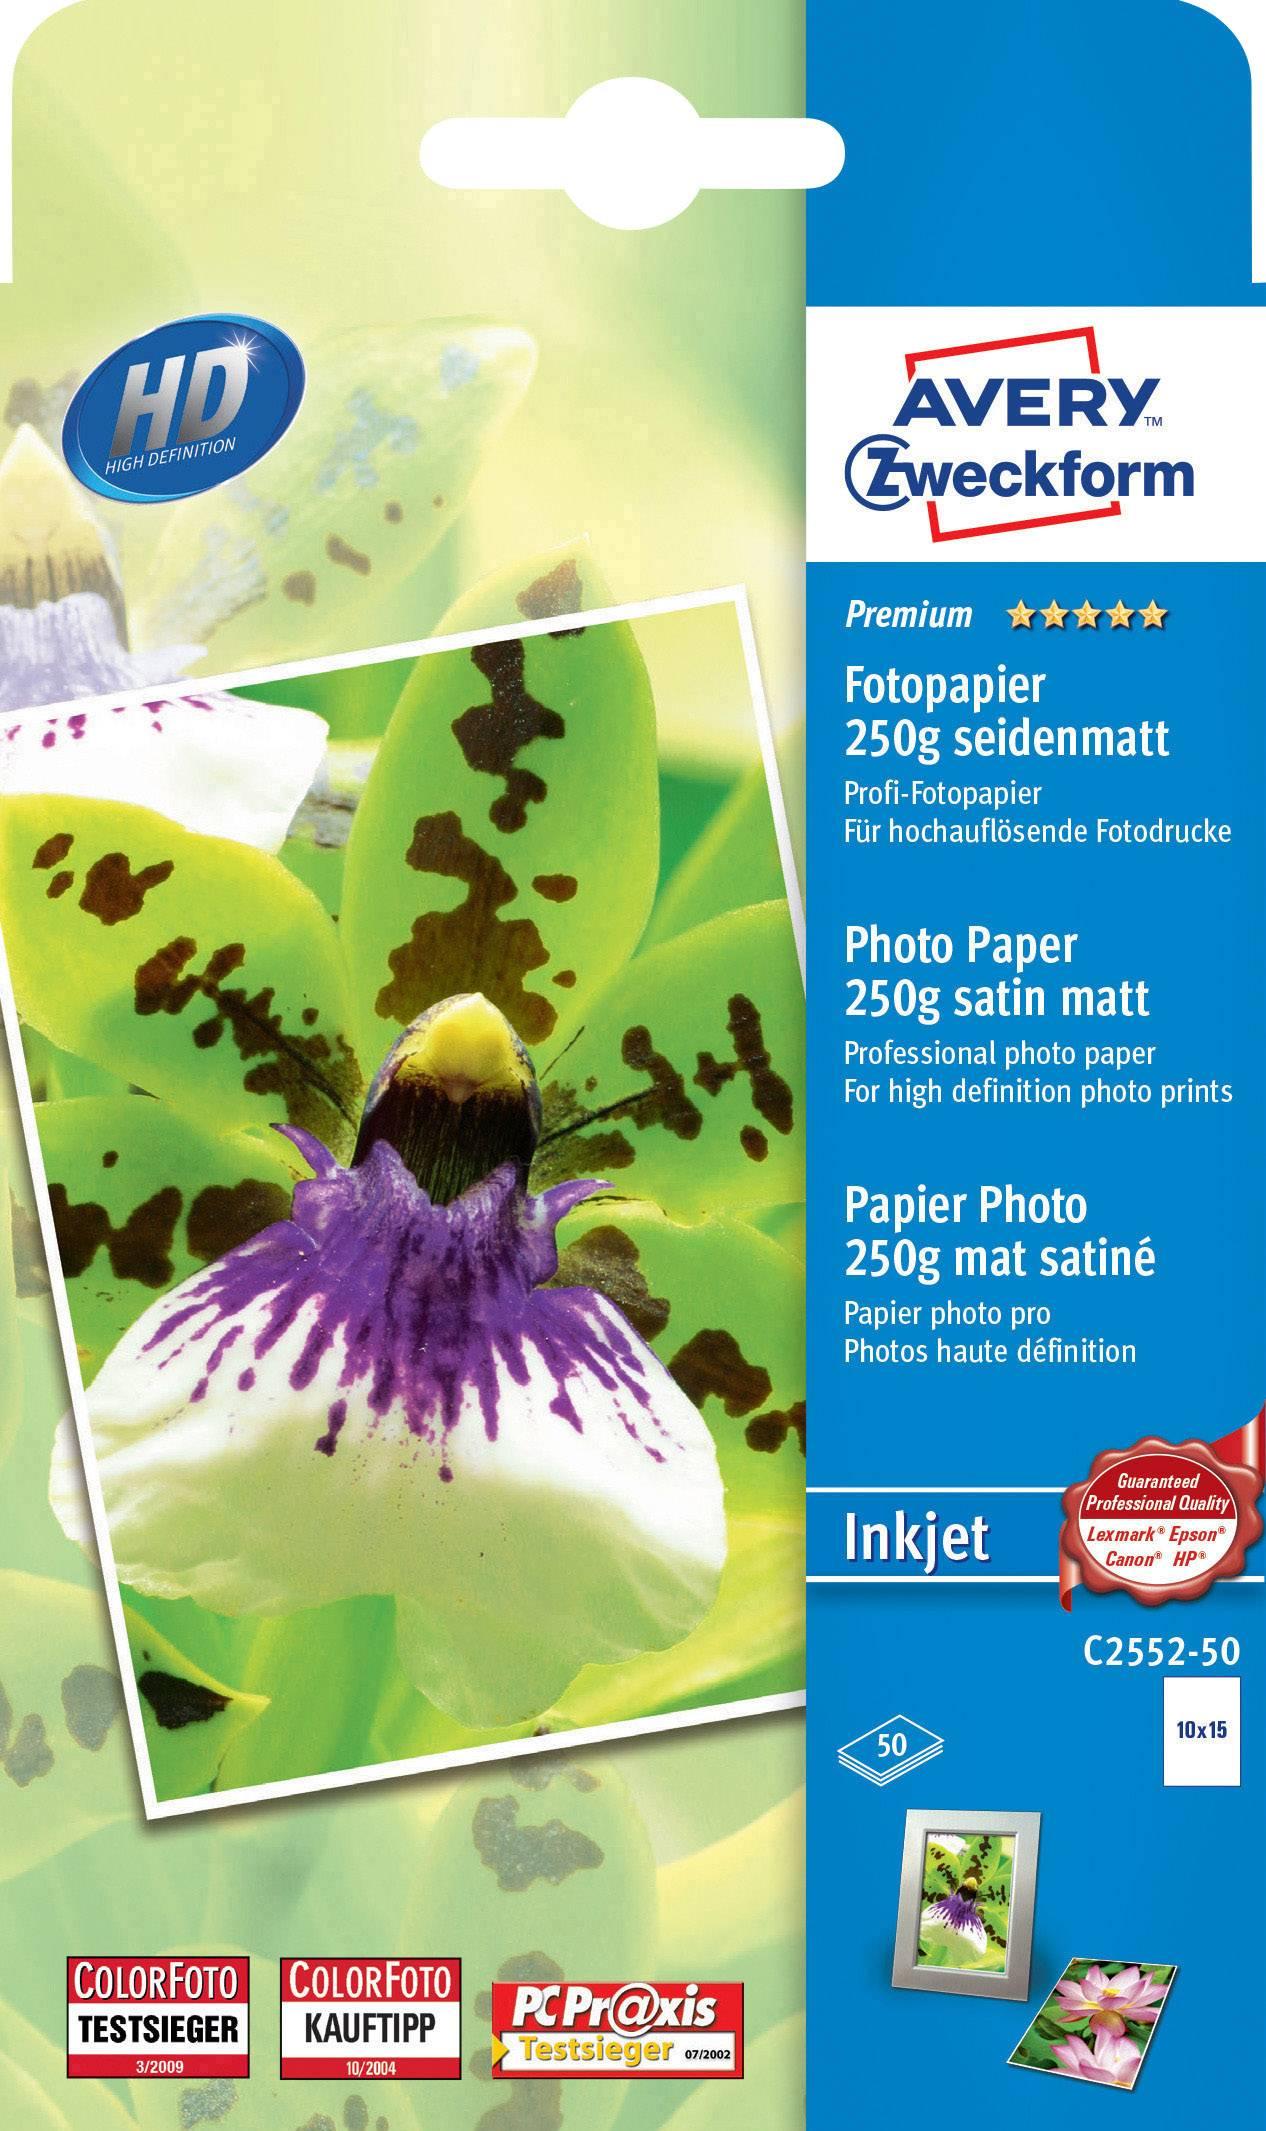 Fotografický papier Avery-Zweckform Premium Photo Paper Inkjet C2552-50, 10 x 15 cm, 250 gm², 50 listov